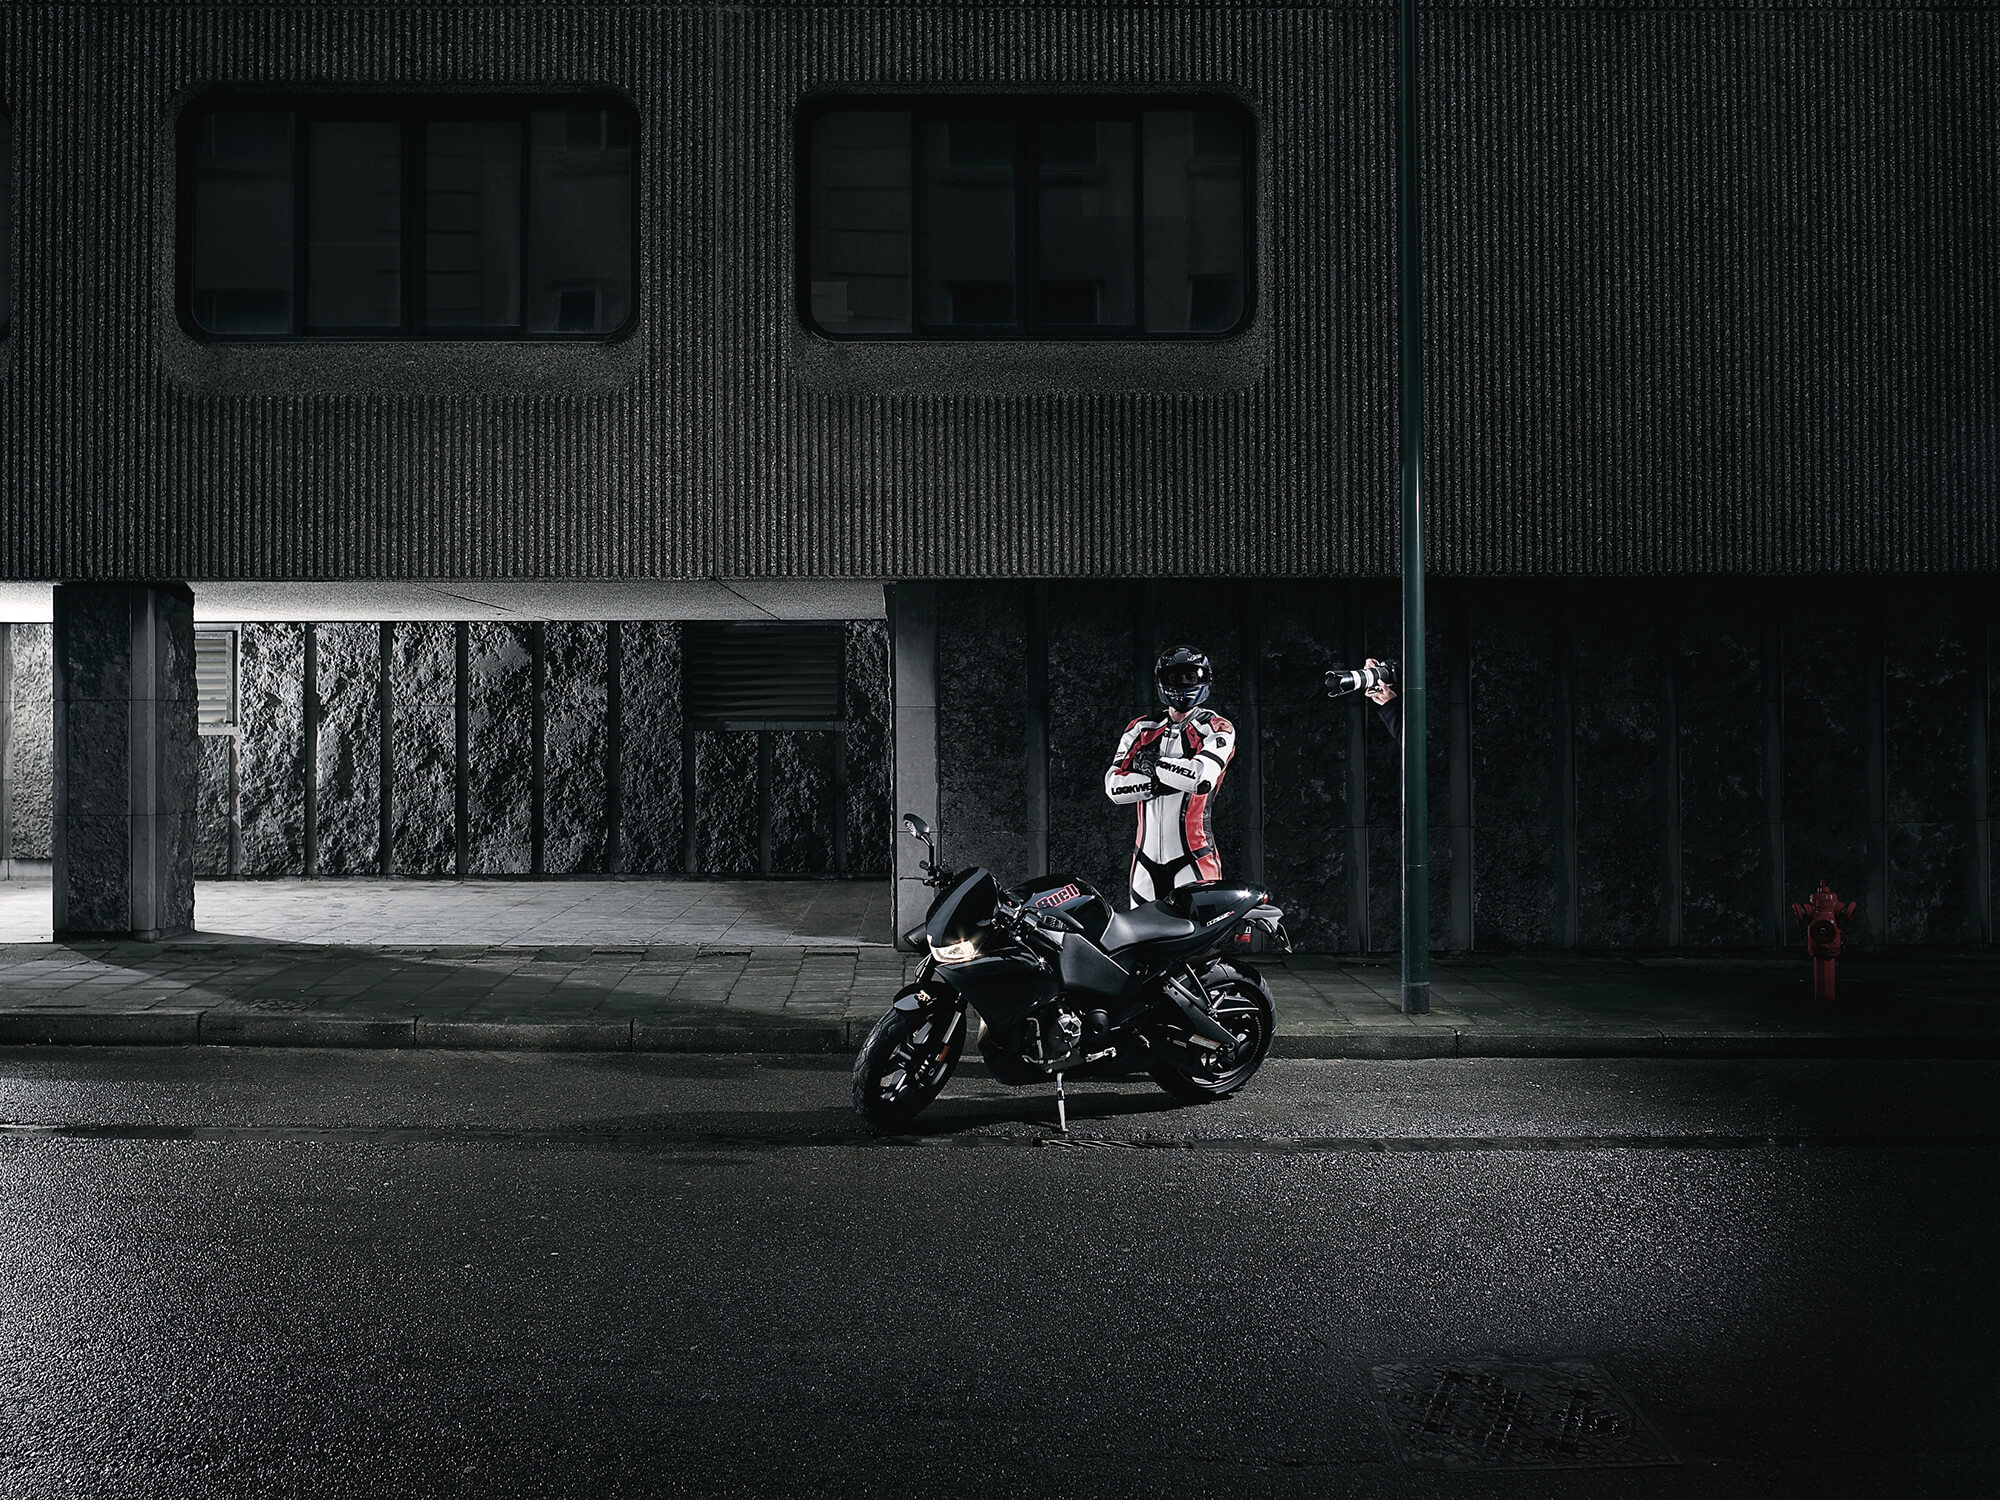 Harley Davidson by Geert de Taeye